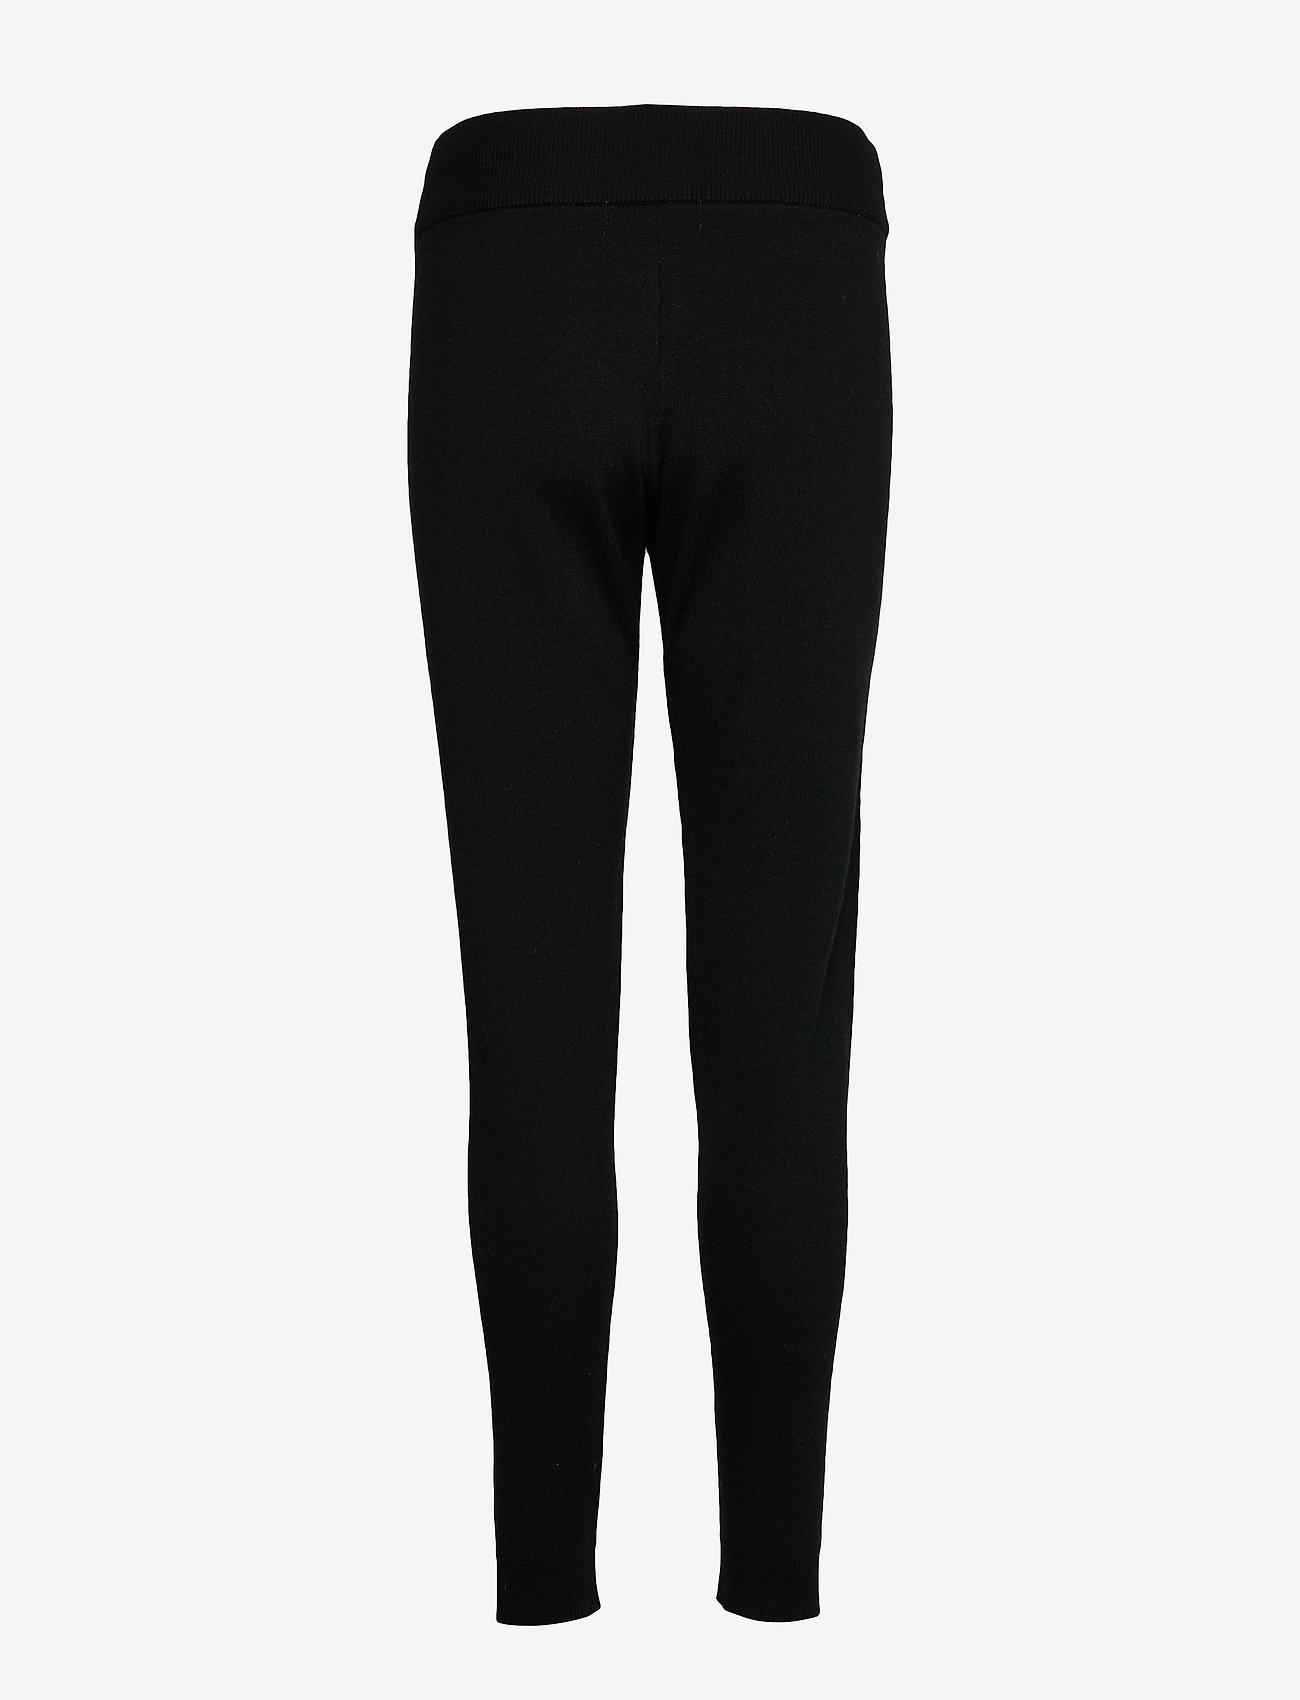 Icebreaker - Wmns Carrigan Sweater Pants - pants - black - 1